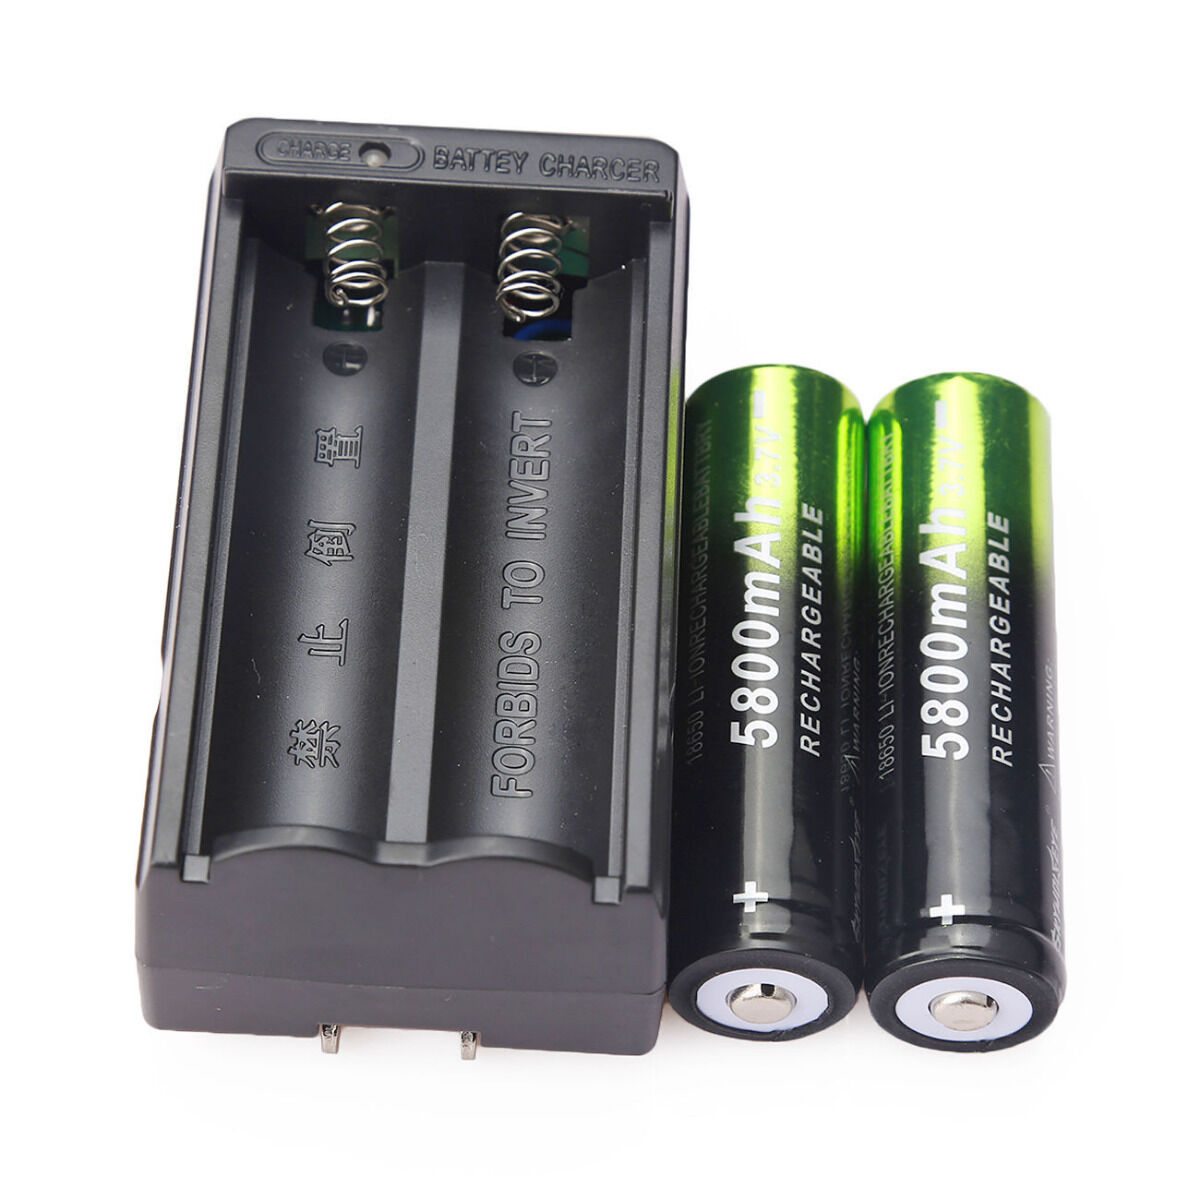 4X SKYWOLFEYE 18650 Battery 5800mAh Li-ion 3.7V Rechargeable Batteries + Charger